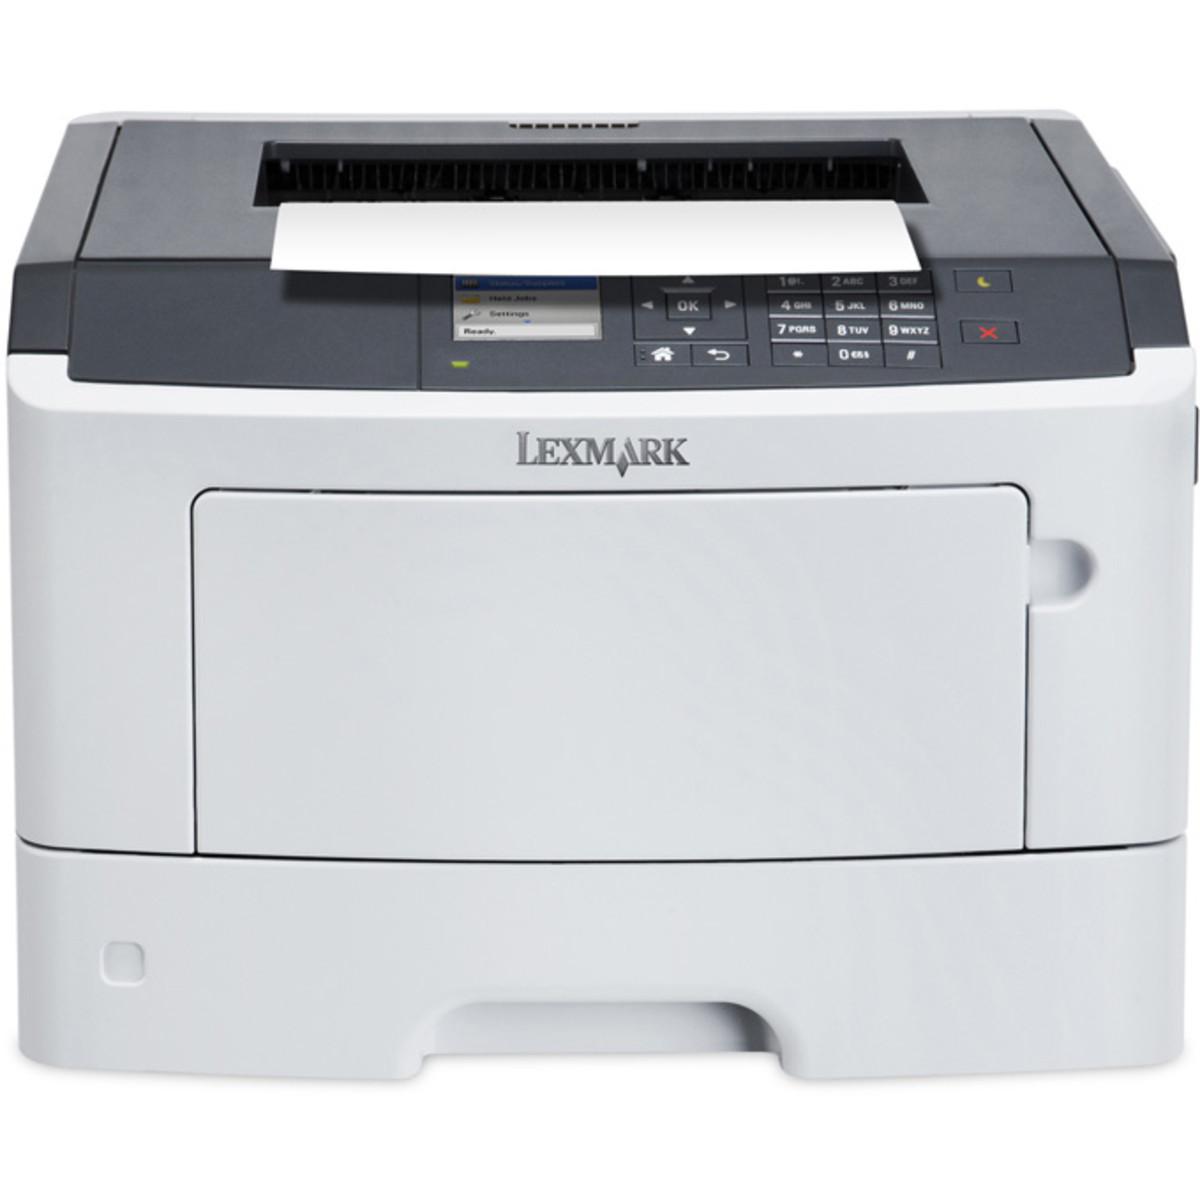 Lexmark MS415dn Laser Printer